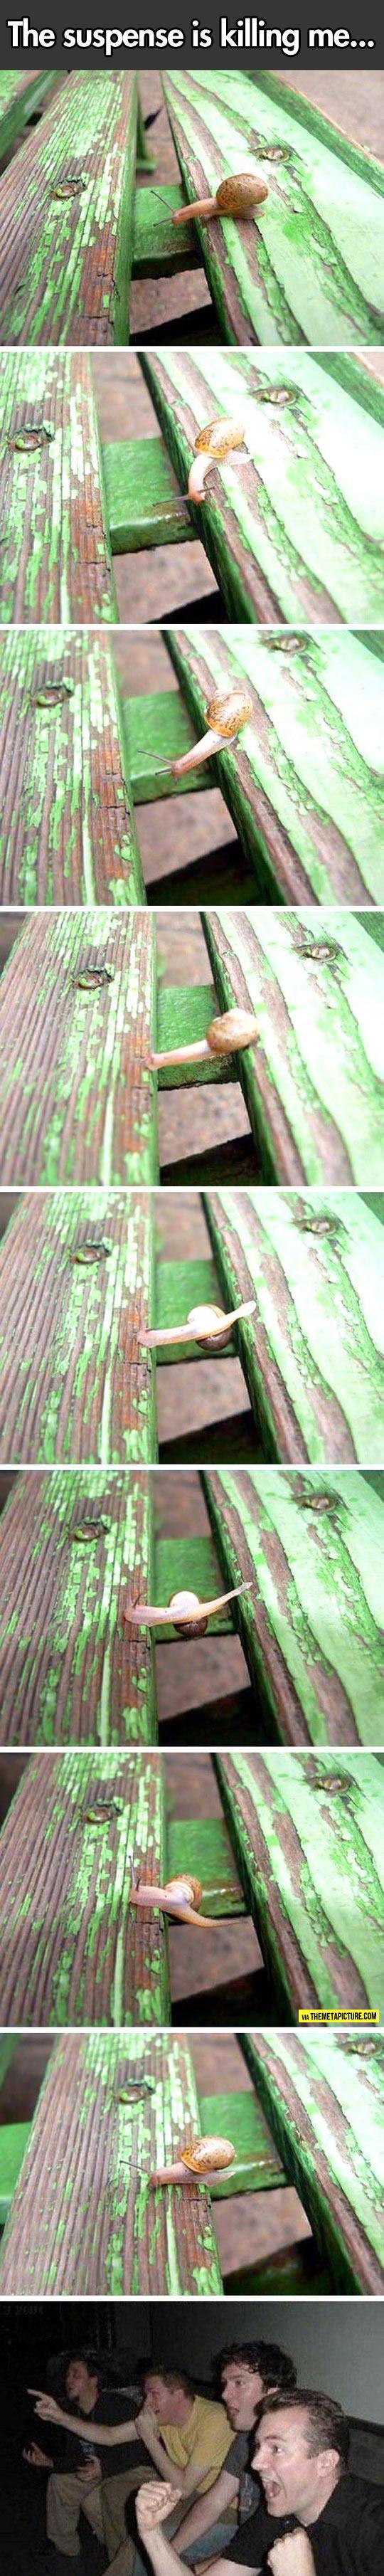 cool-snail-time-slow-suspense